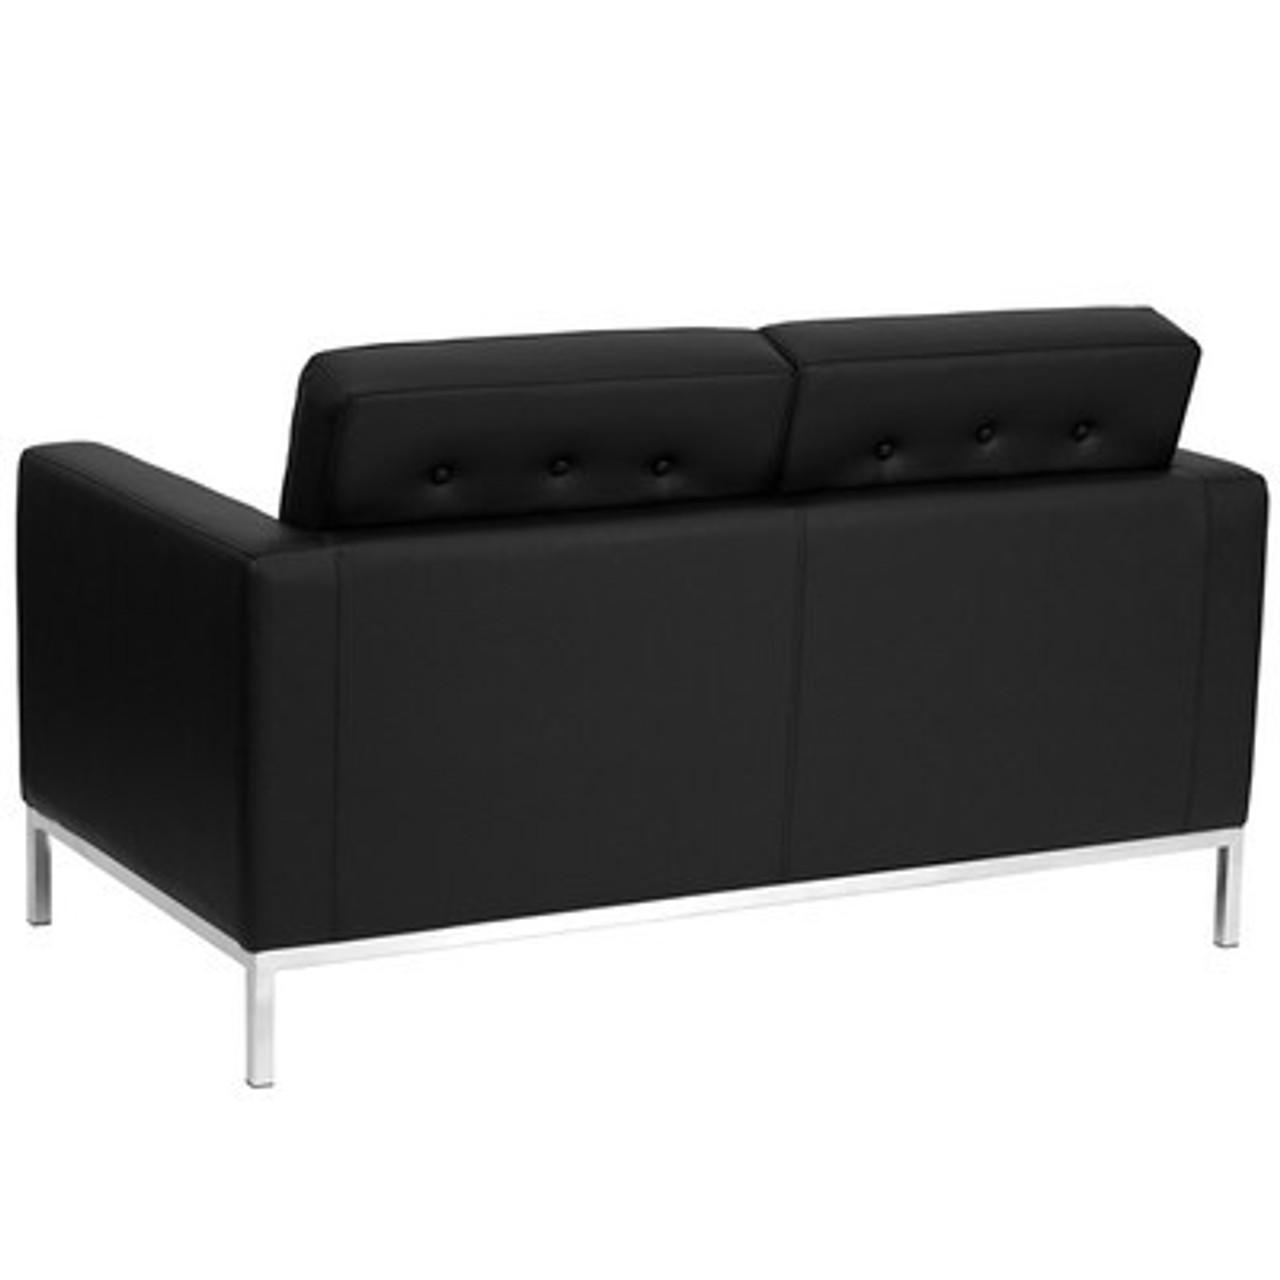 1pc Modern Leather Office Reception Loveseat, FF-0440-12